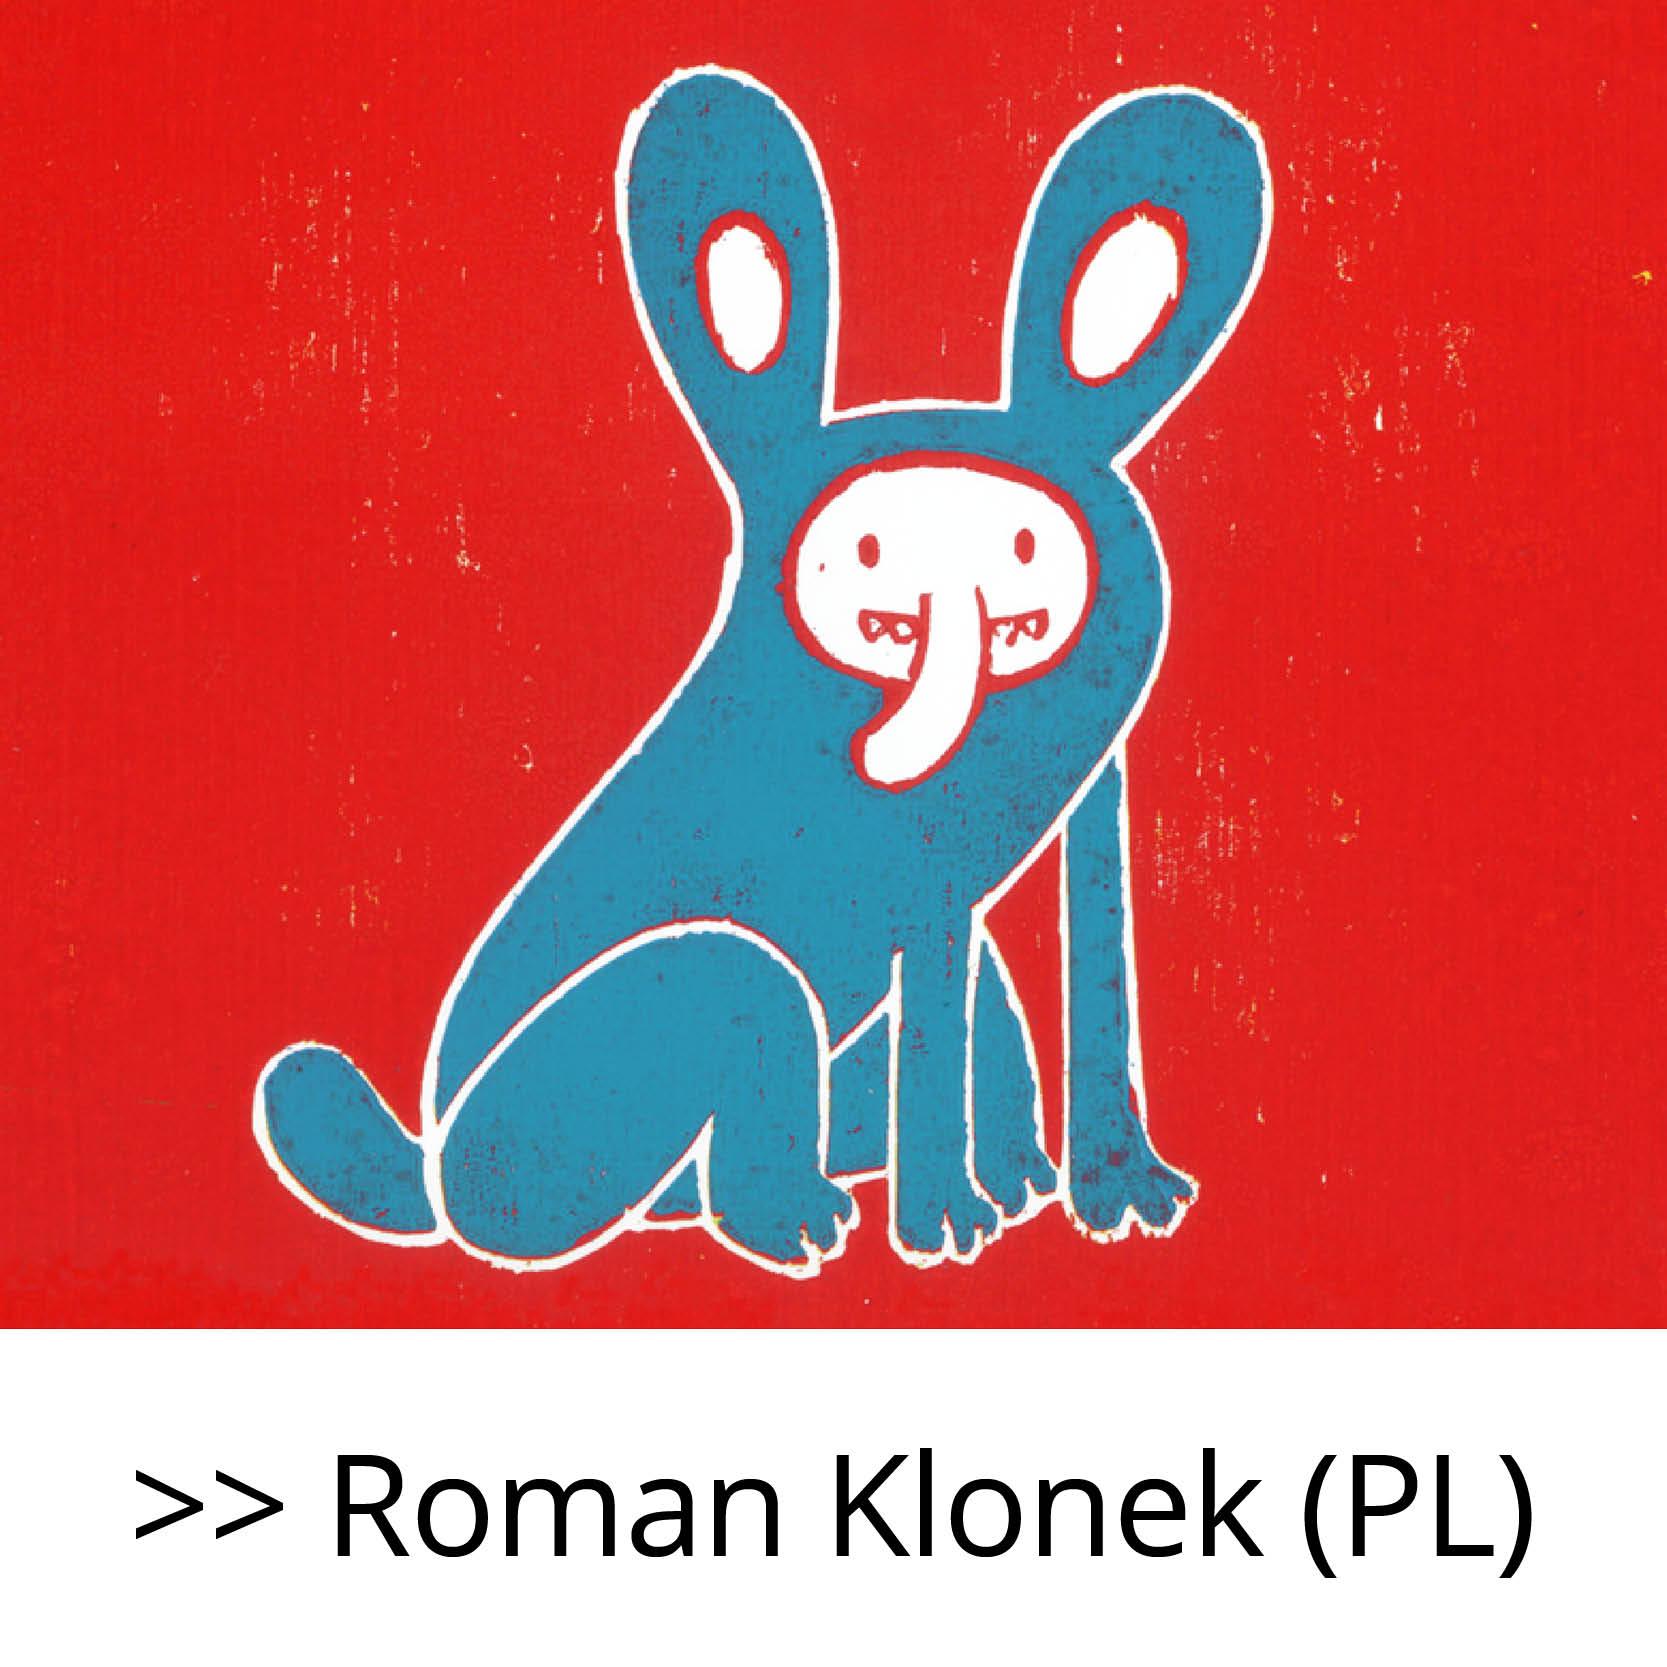 Roman_Klonek_(PL)